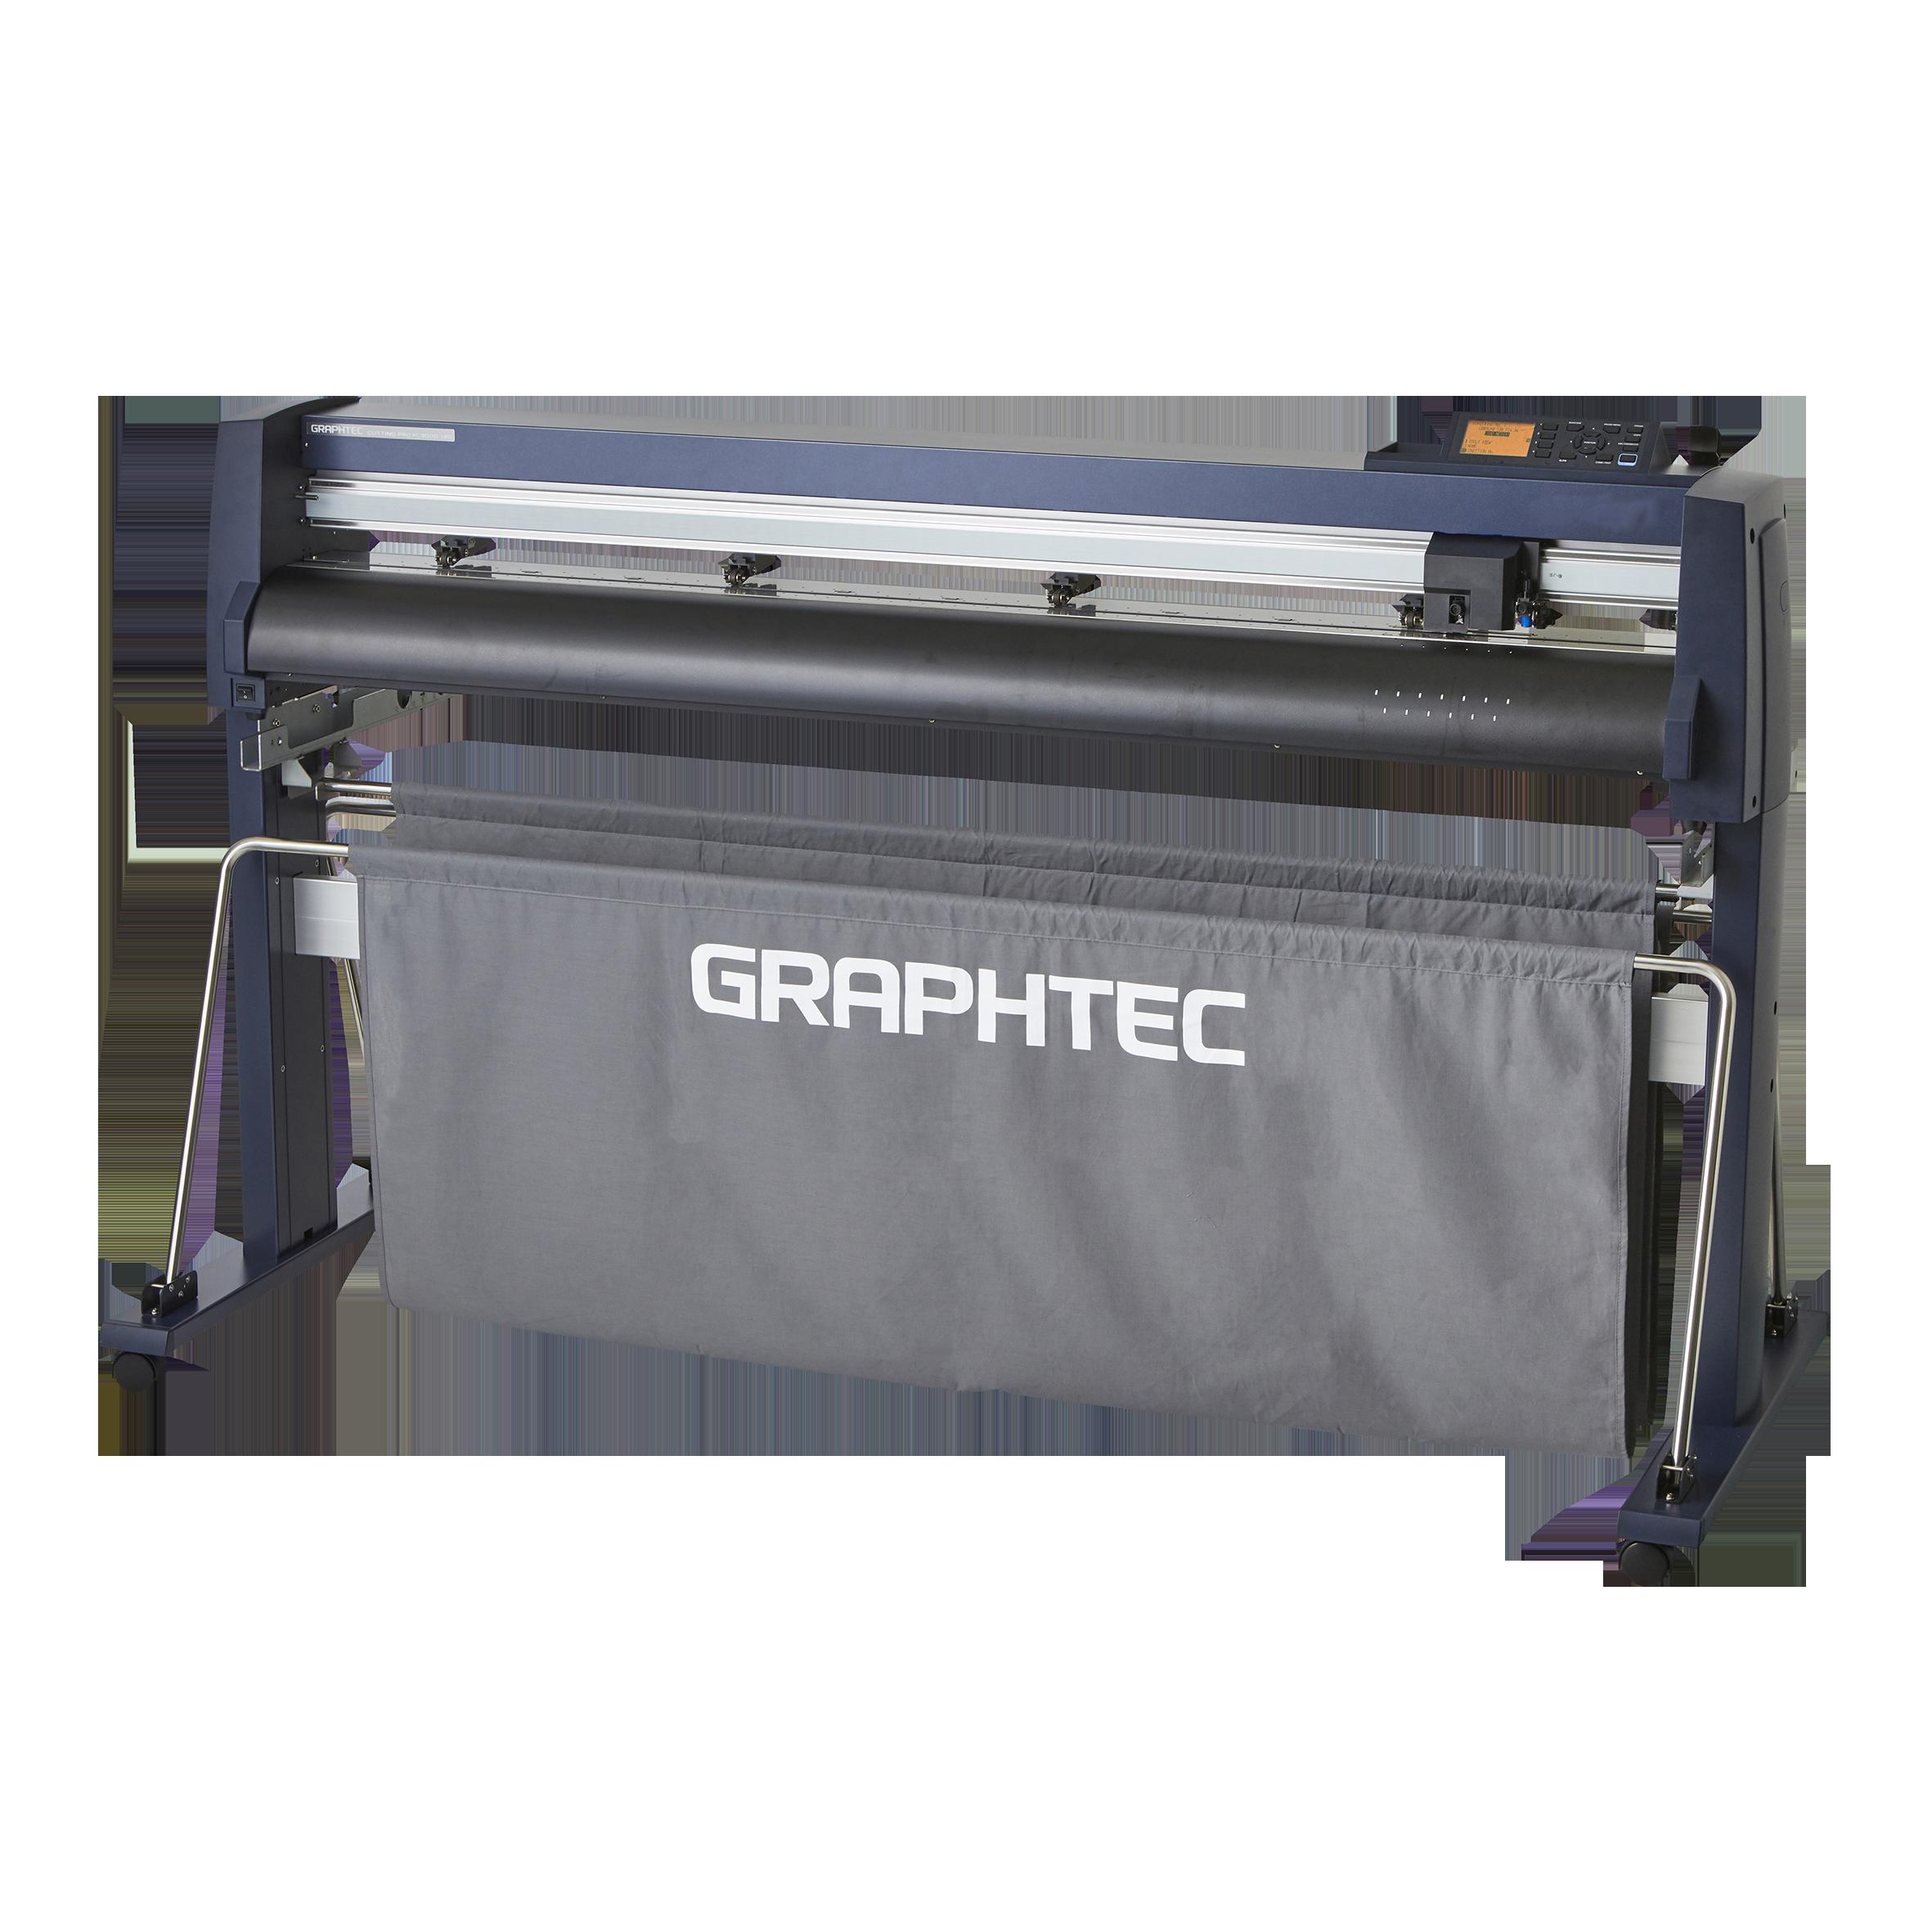 Graphtec FC9000-140 Plotter